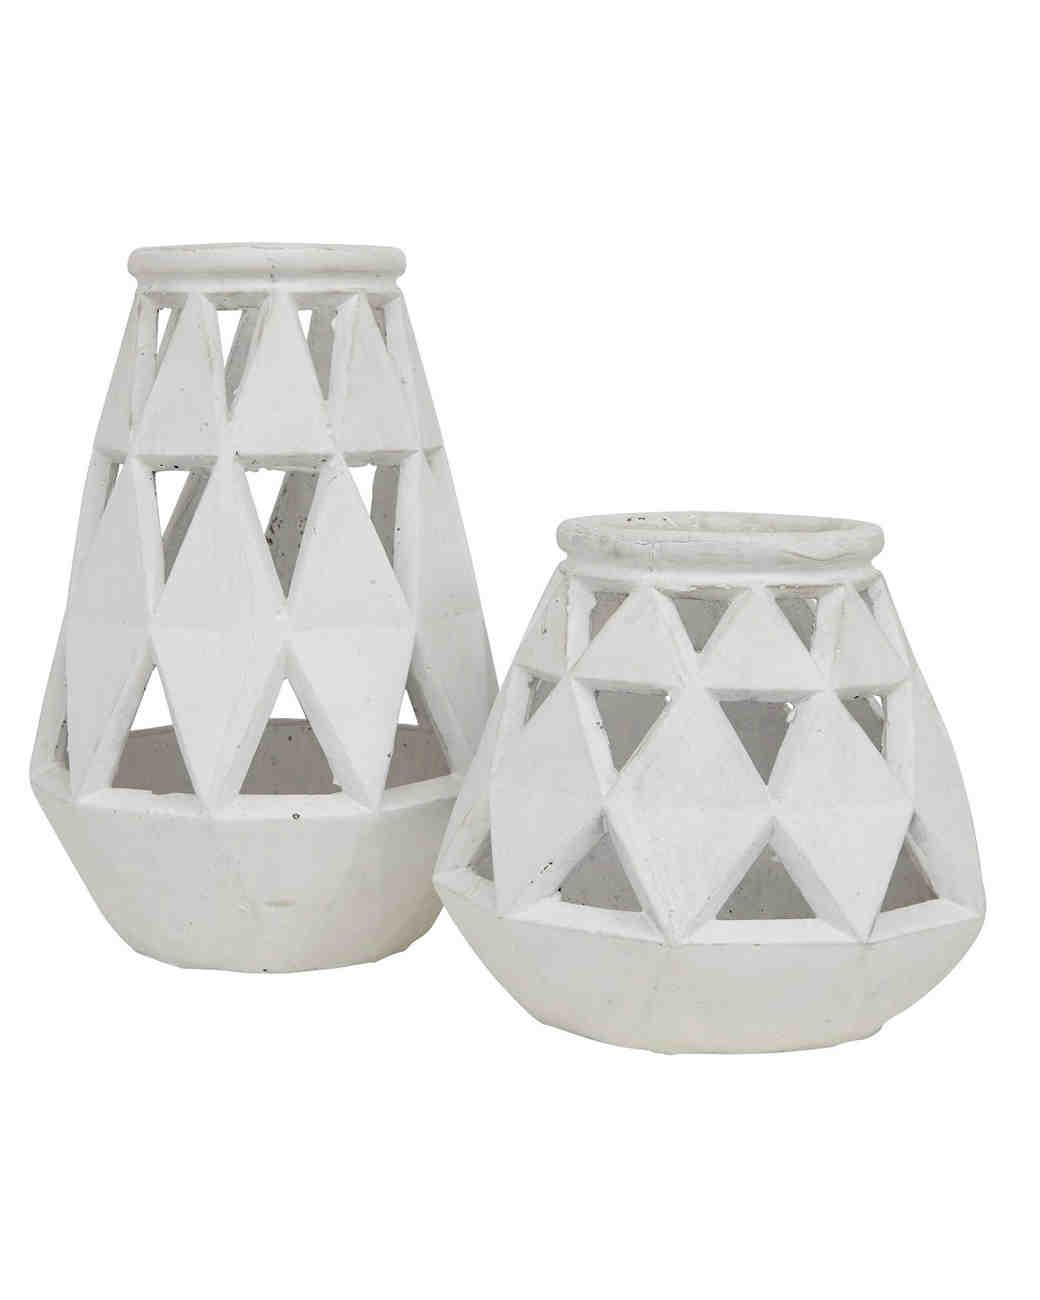 engagement-gifts-jayson-home-marfa-lanterns-0316.jpg